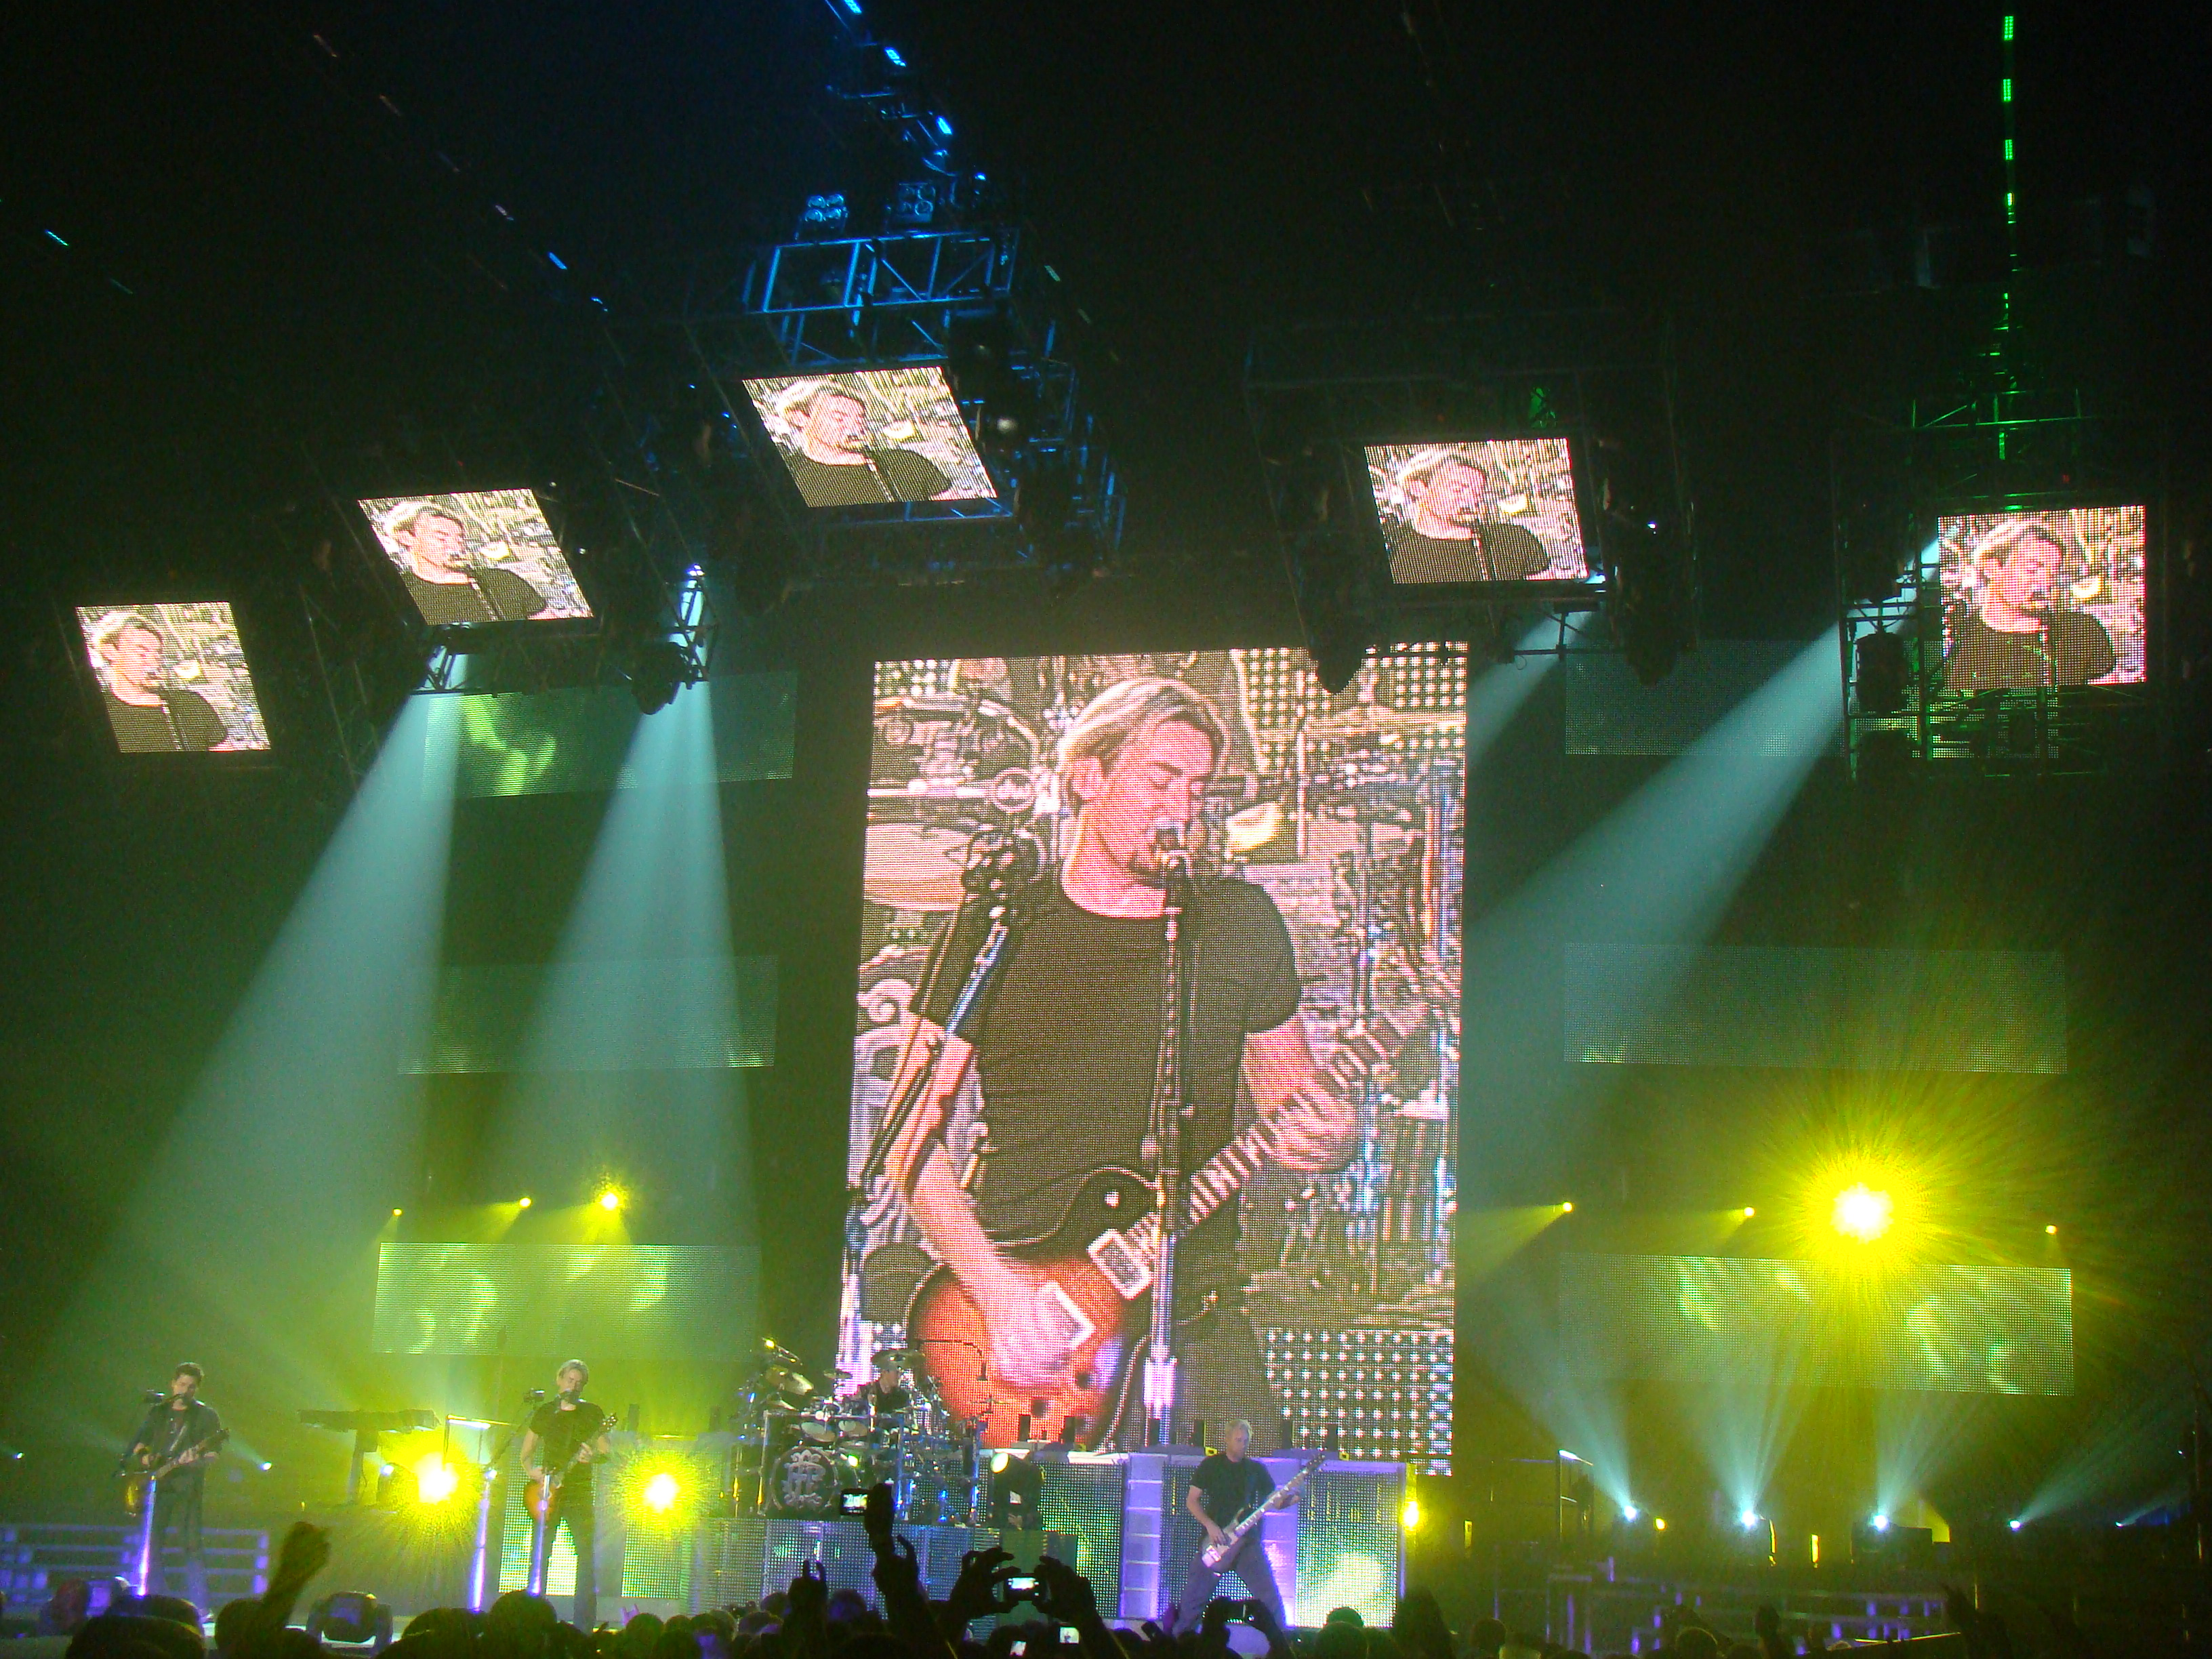 Nickelback Setlist  Tour